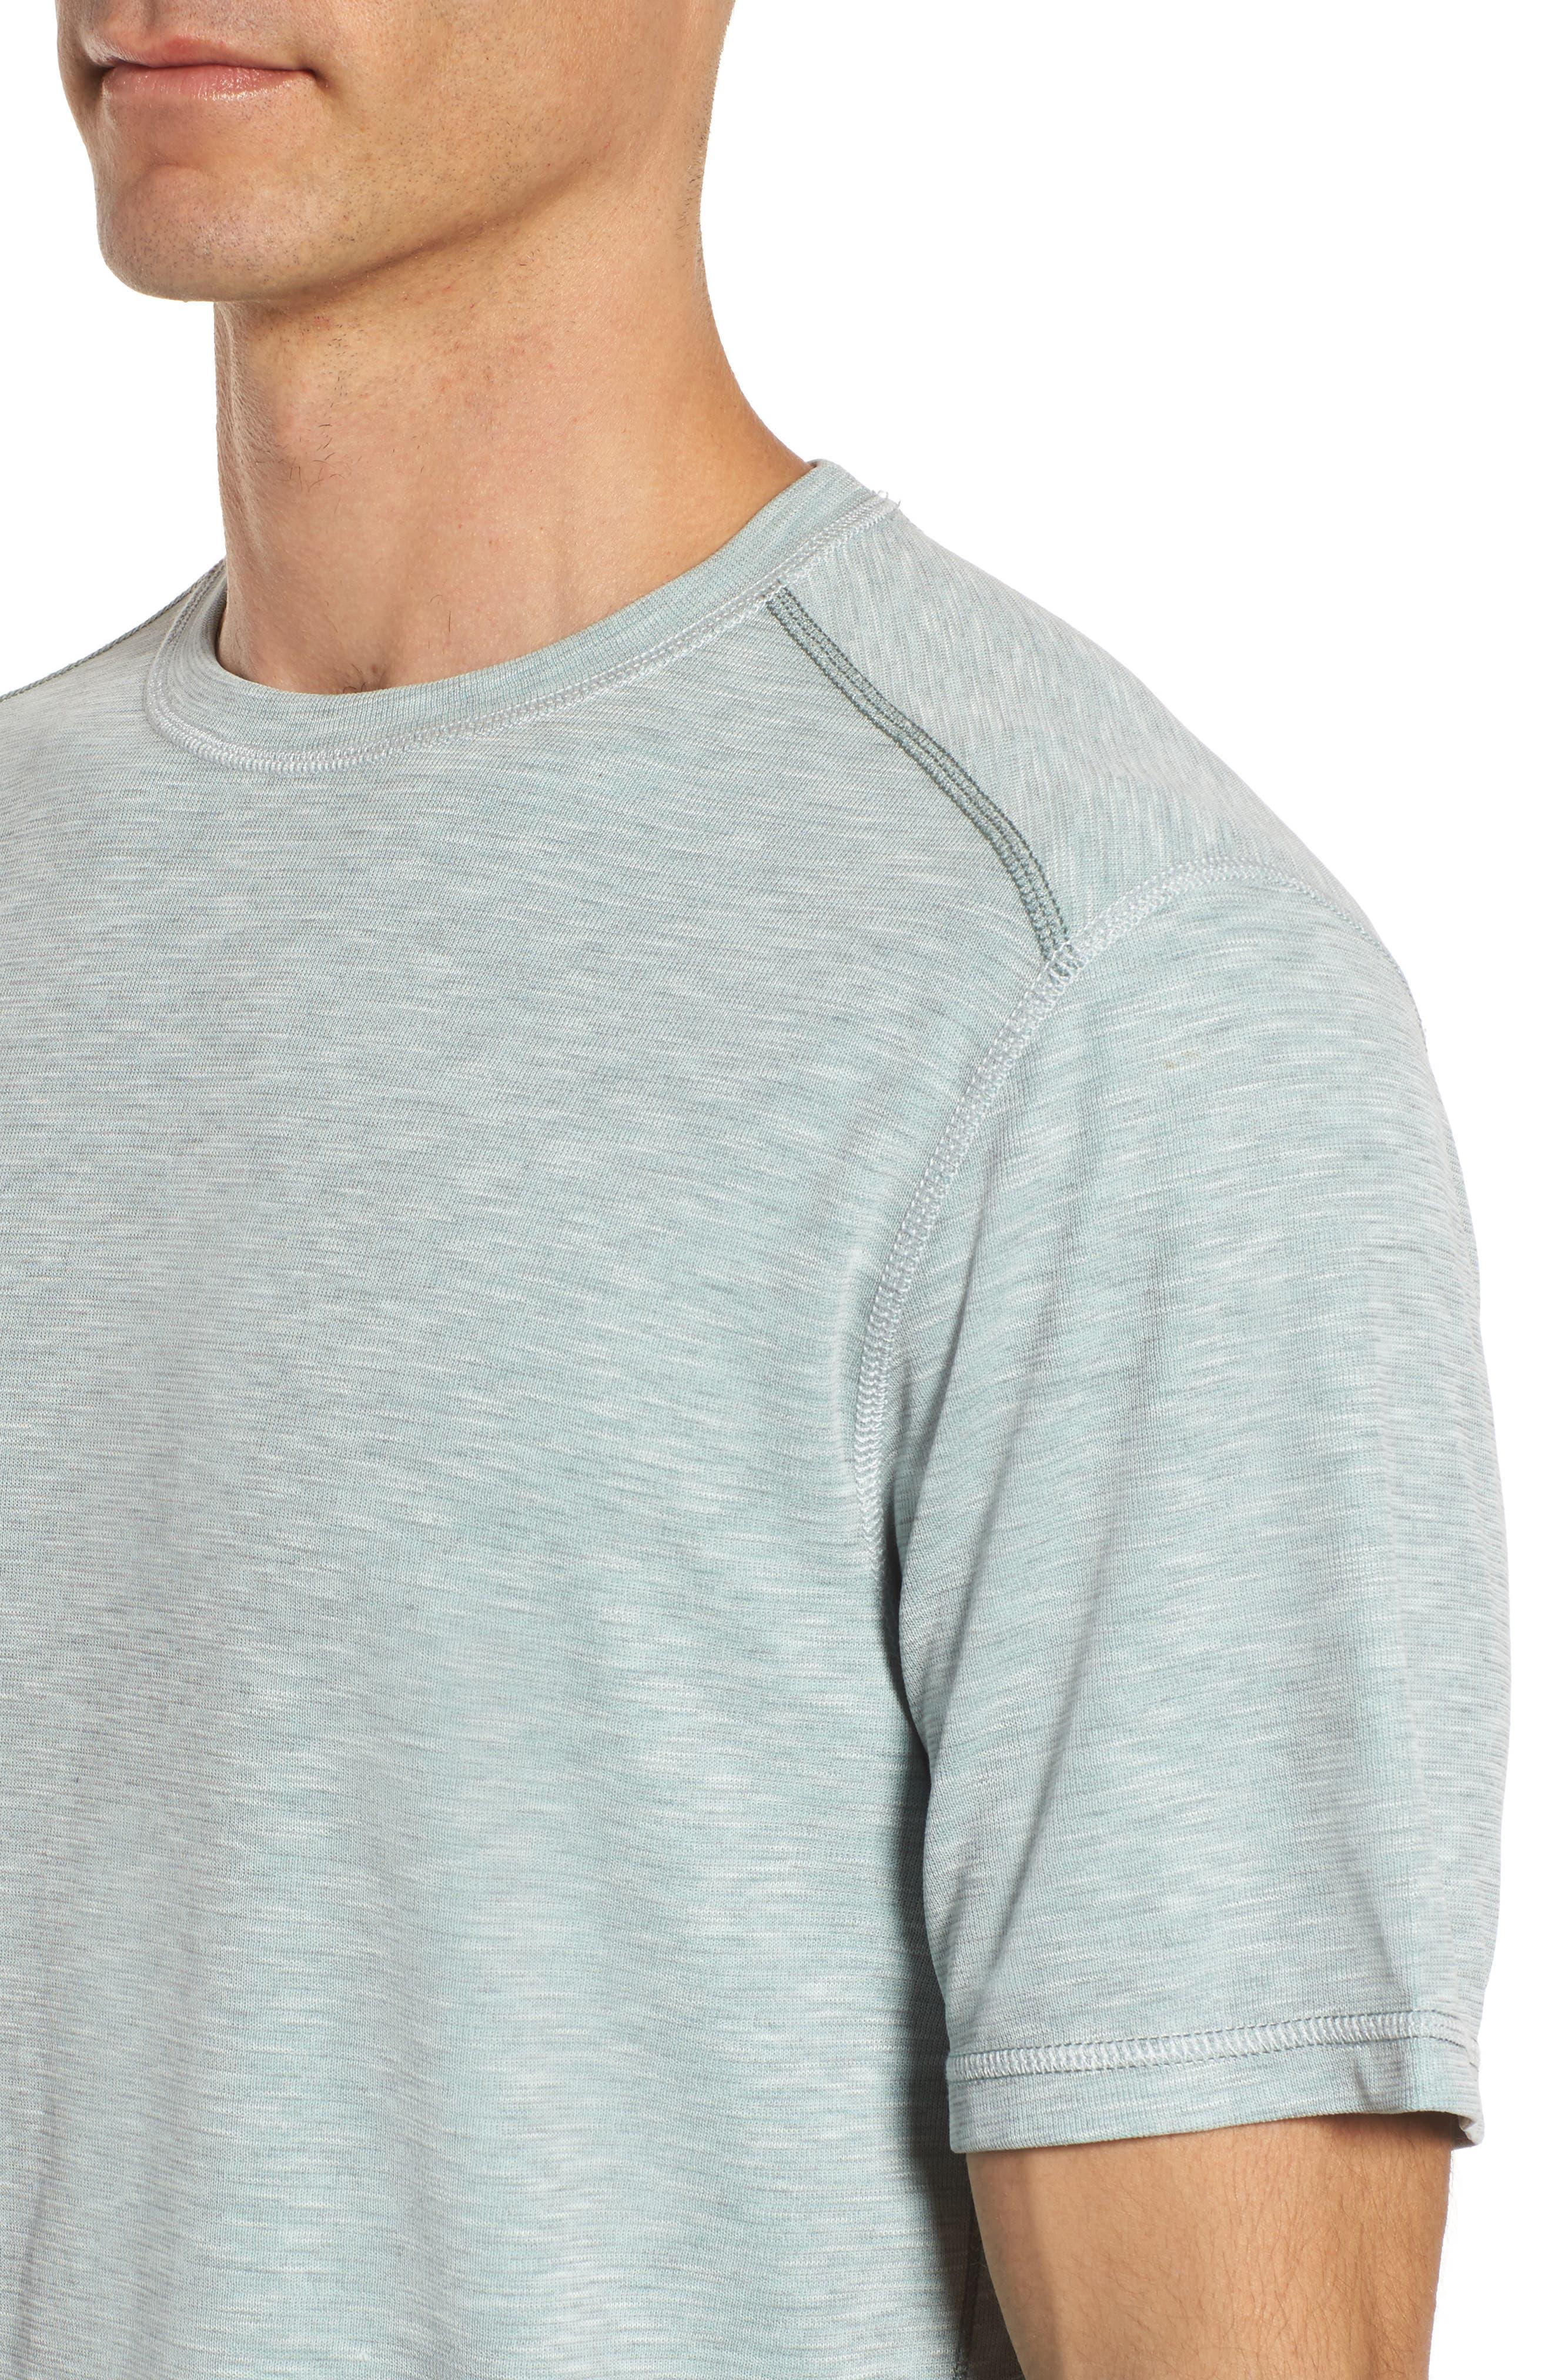 Flip Tide T-Shirt,                             Alternate thumbnail 28, color,